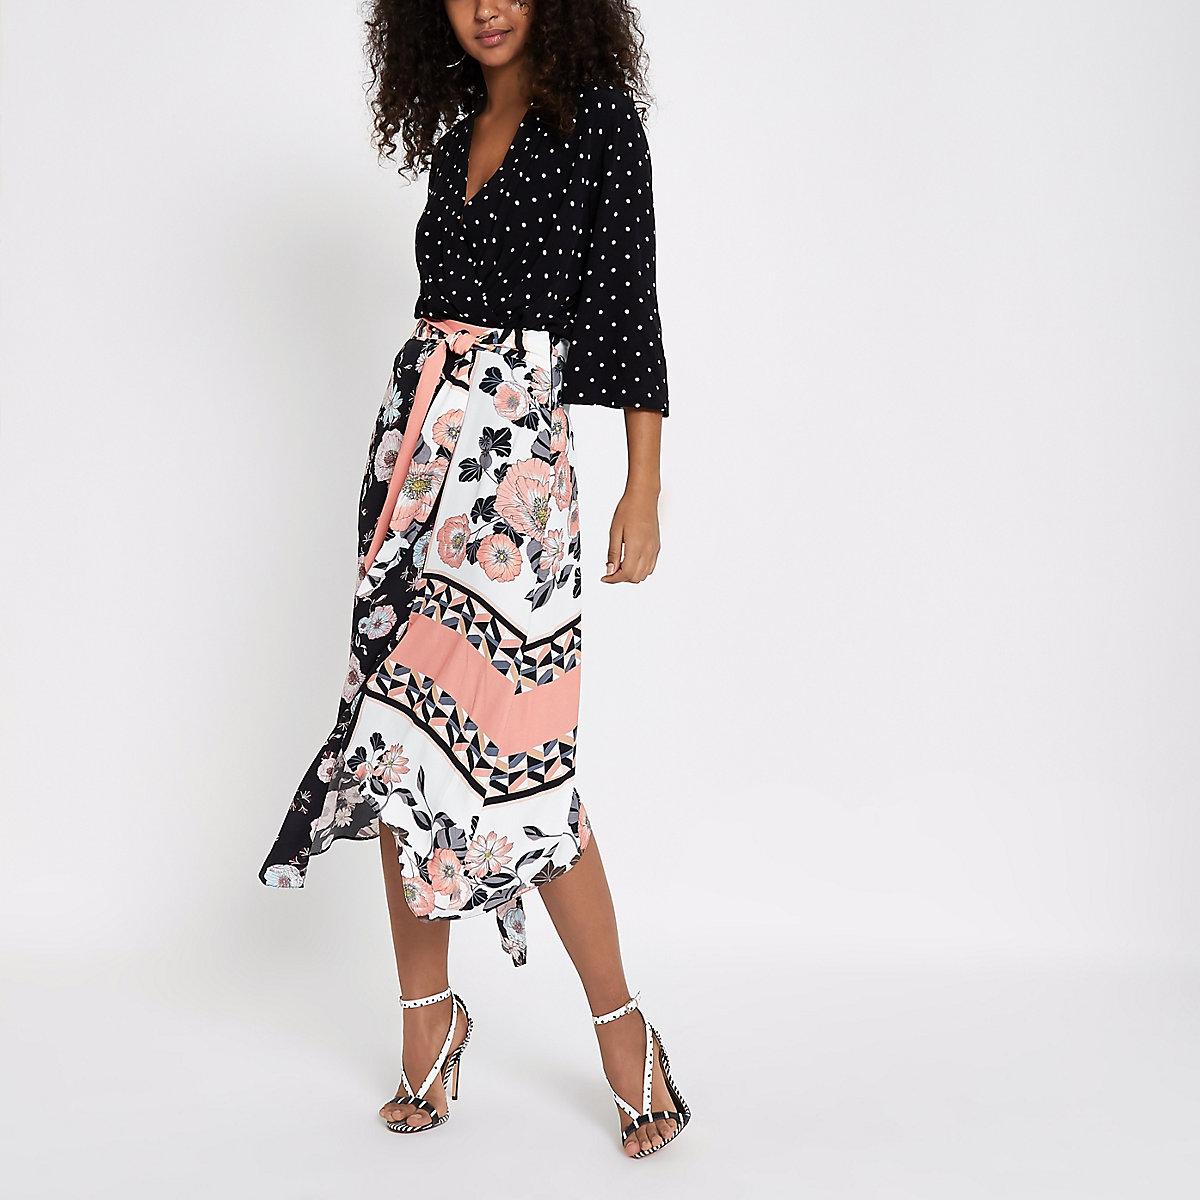 Black floral chiffon hanky hem skirt